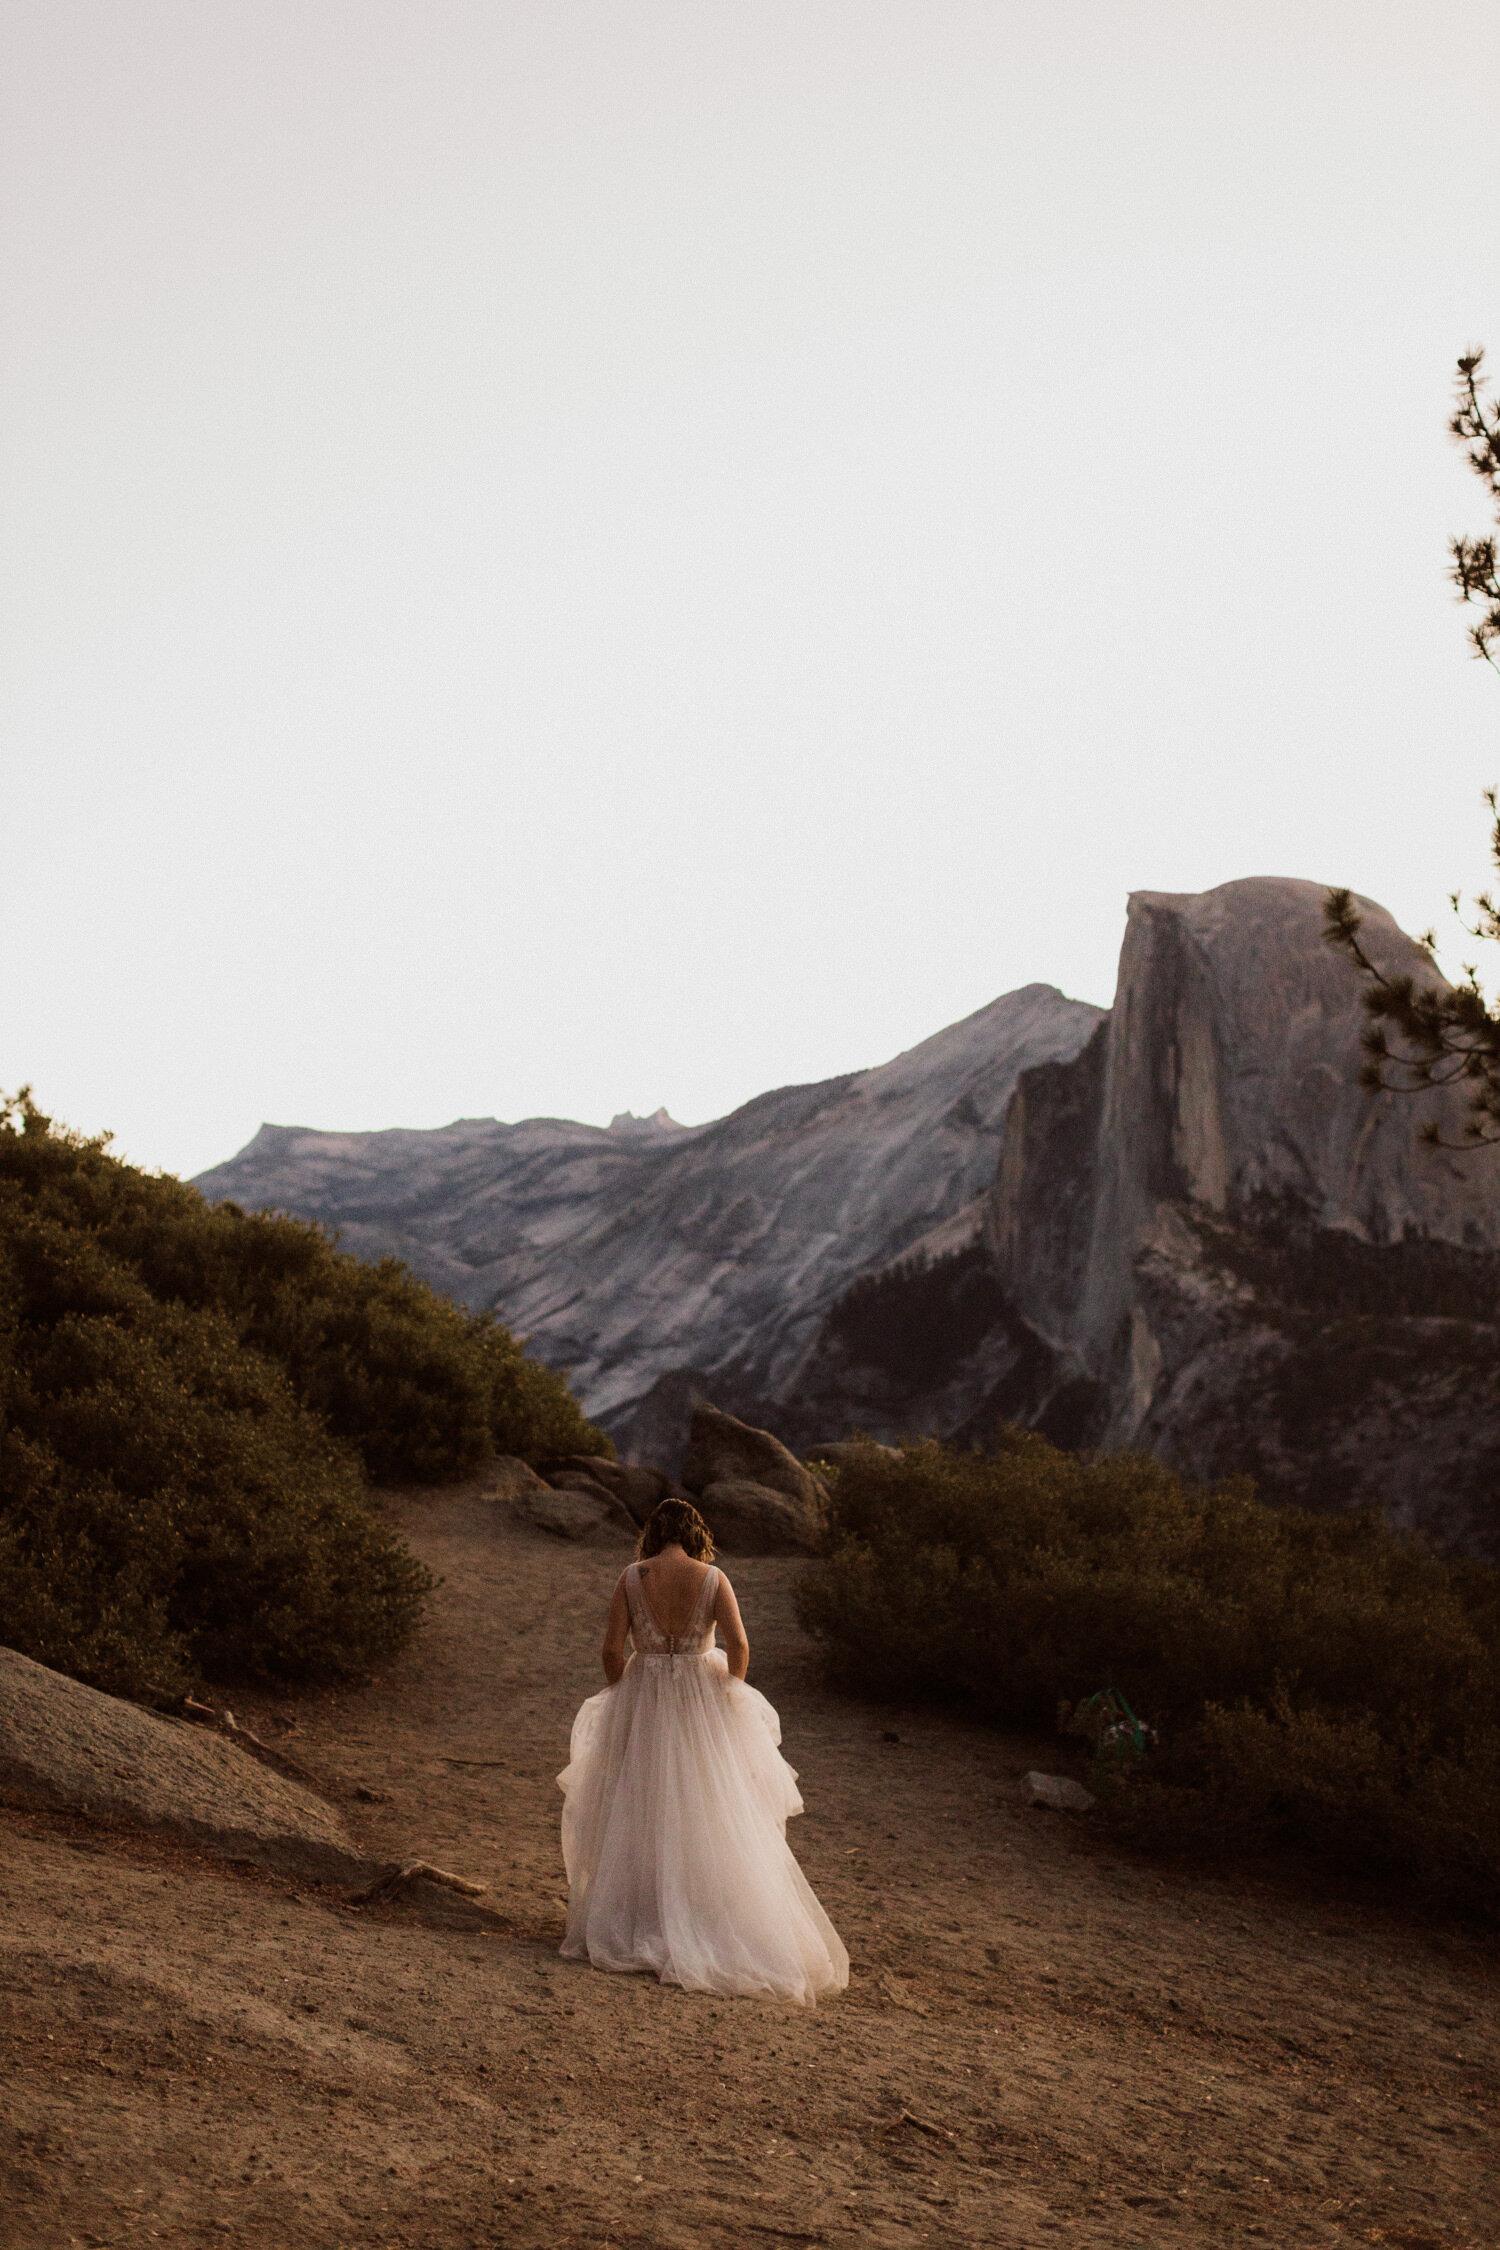 adventure-wedding-yosemite-national-park-2.jpg